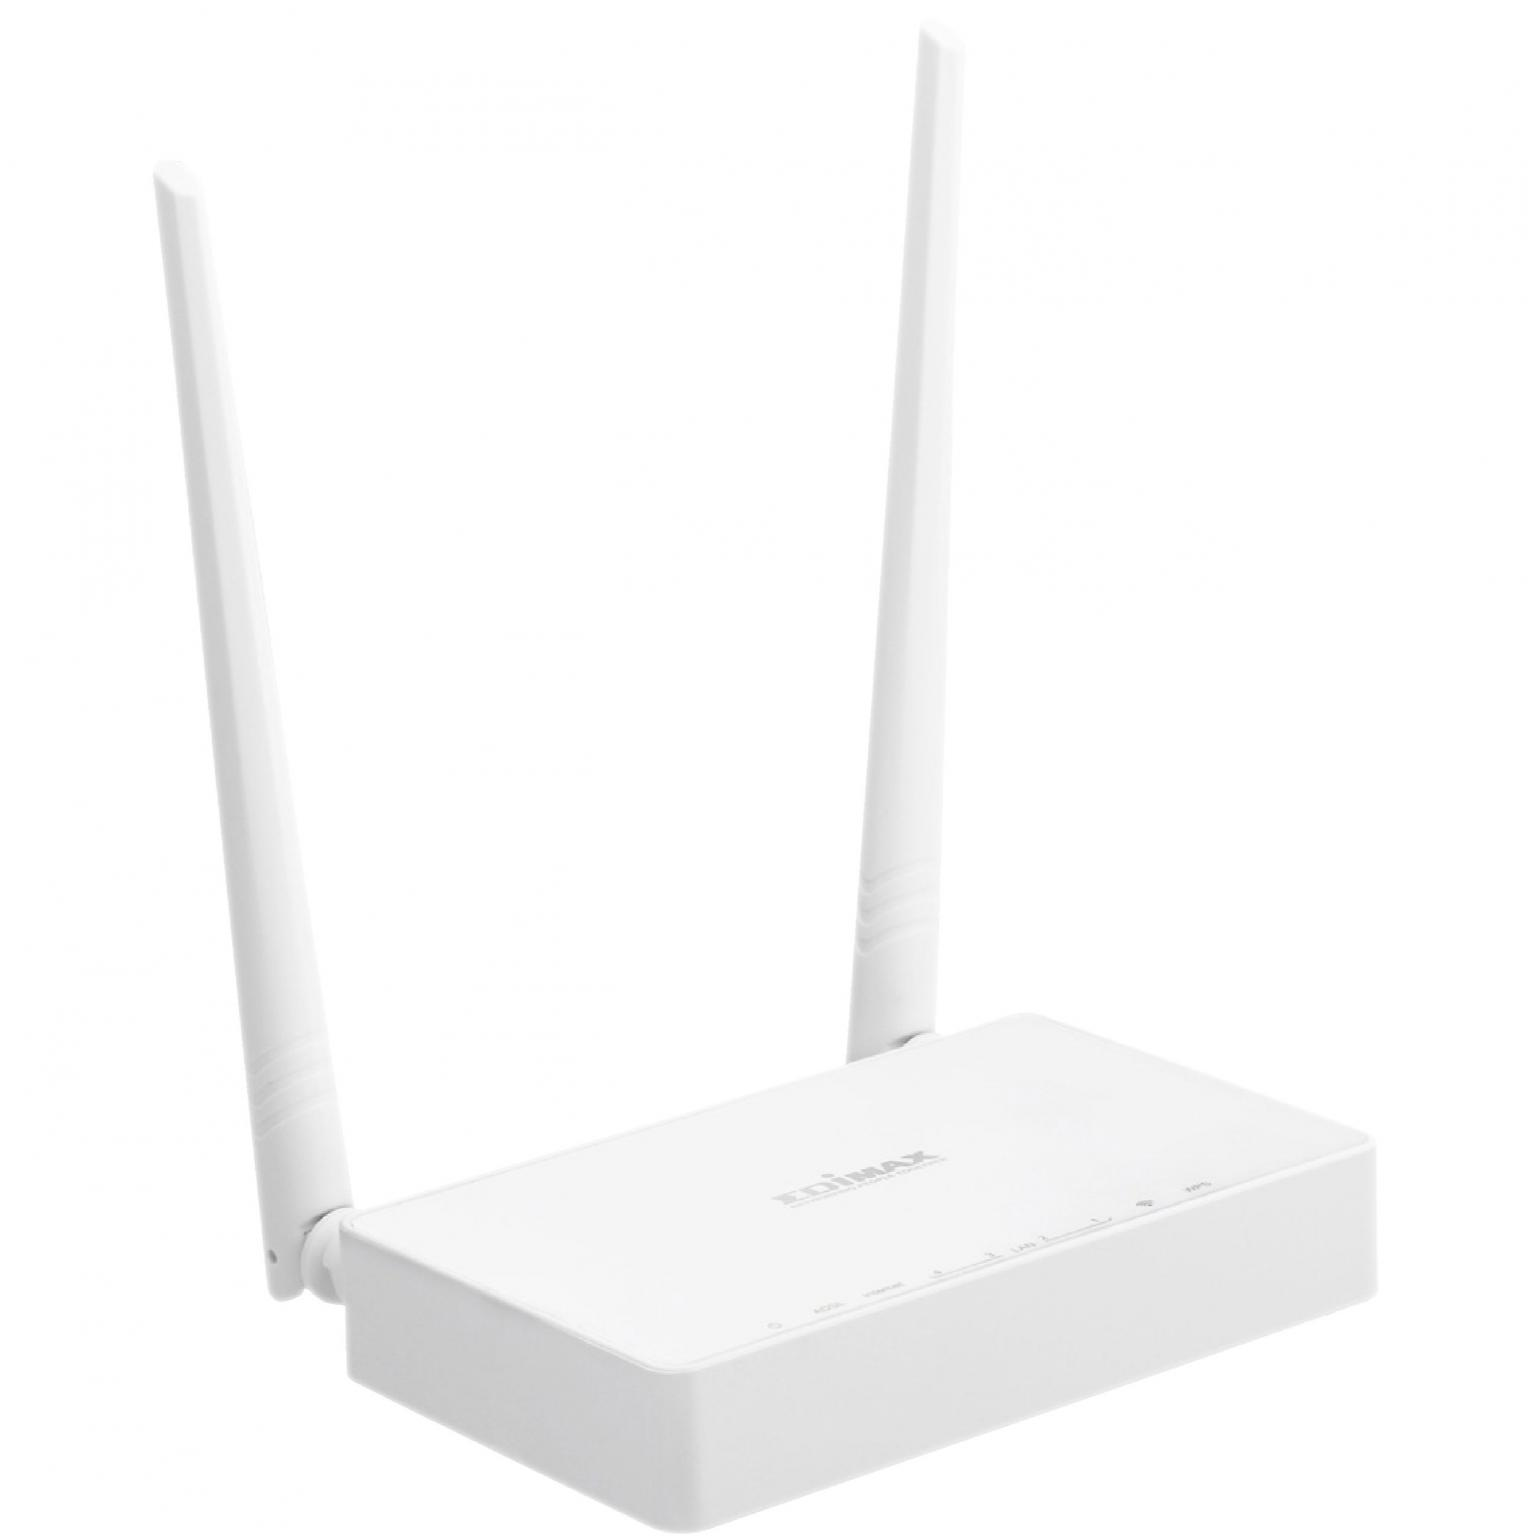 Afbeelding van Draadloze Router 2.4 GHz Wi Fi Wit Edimax